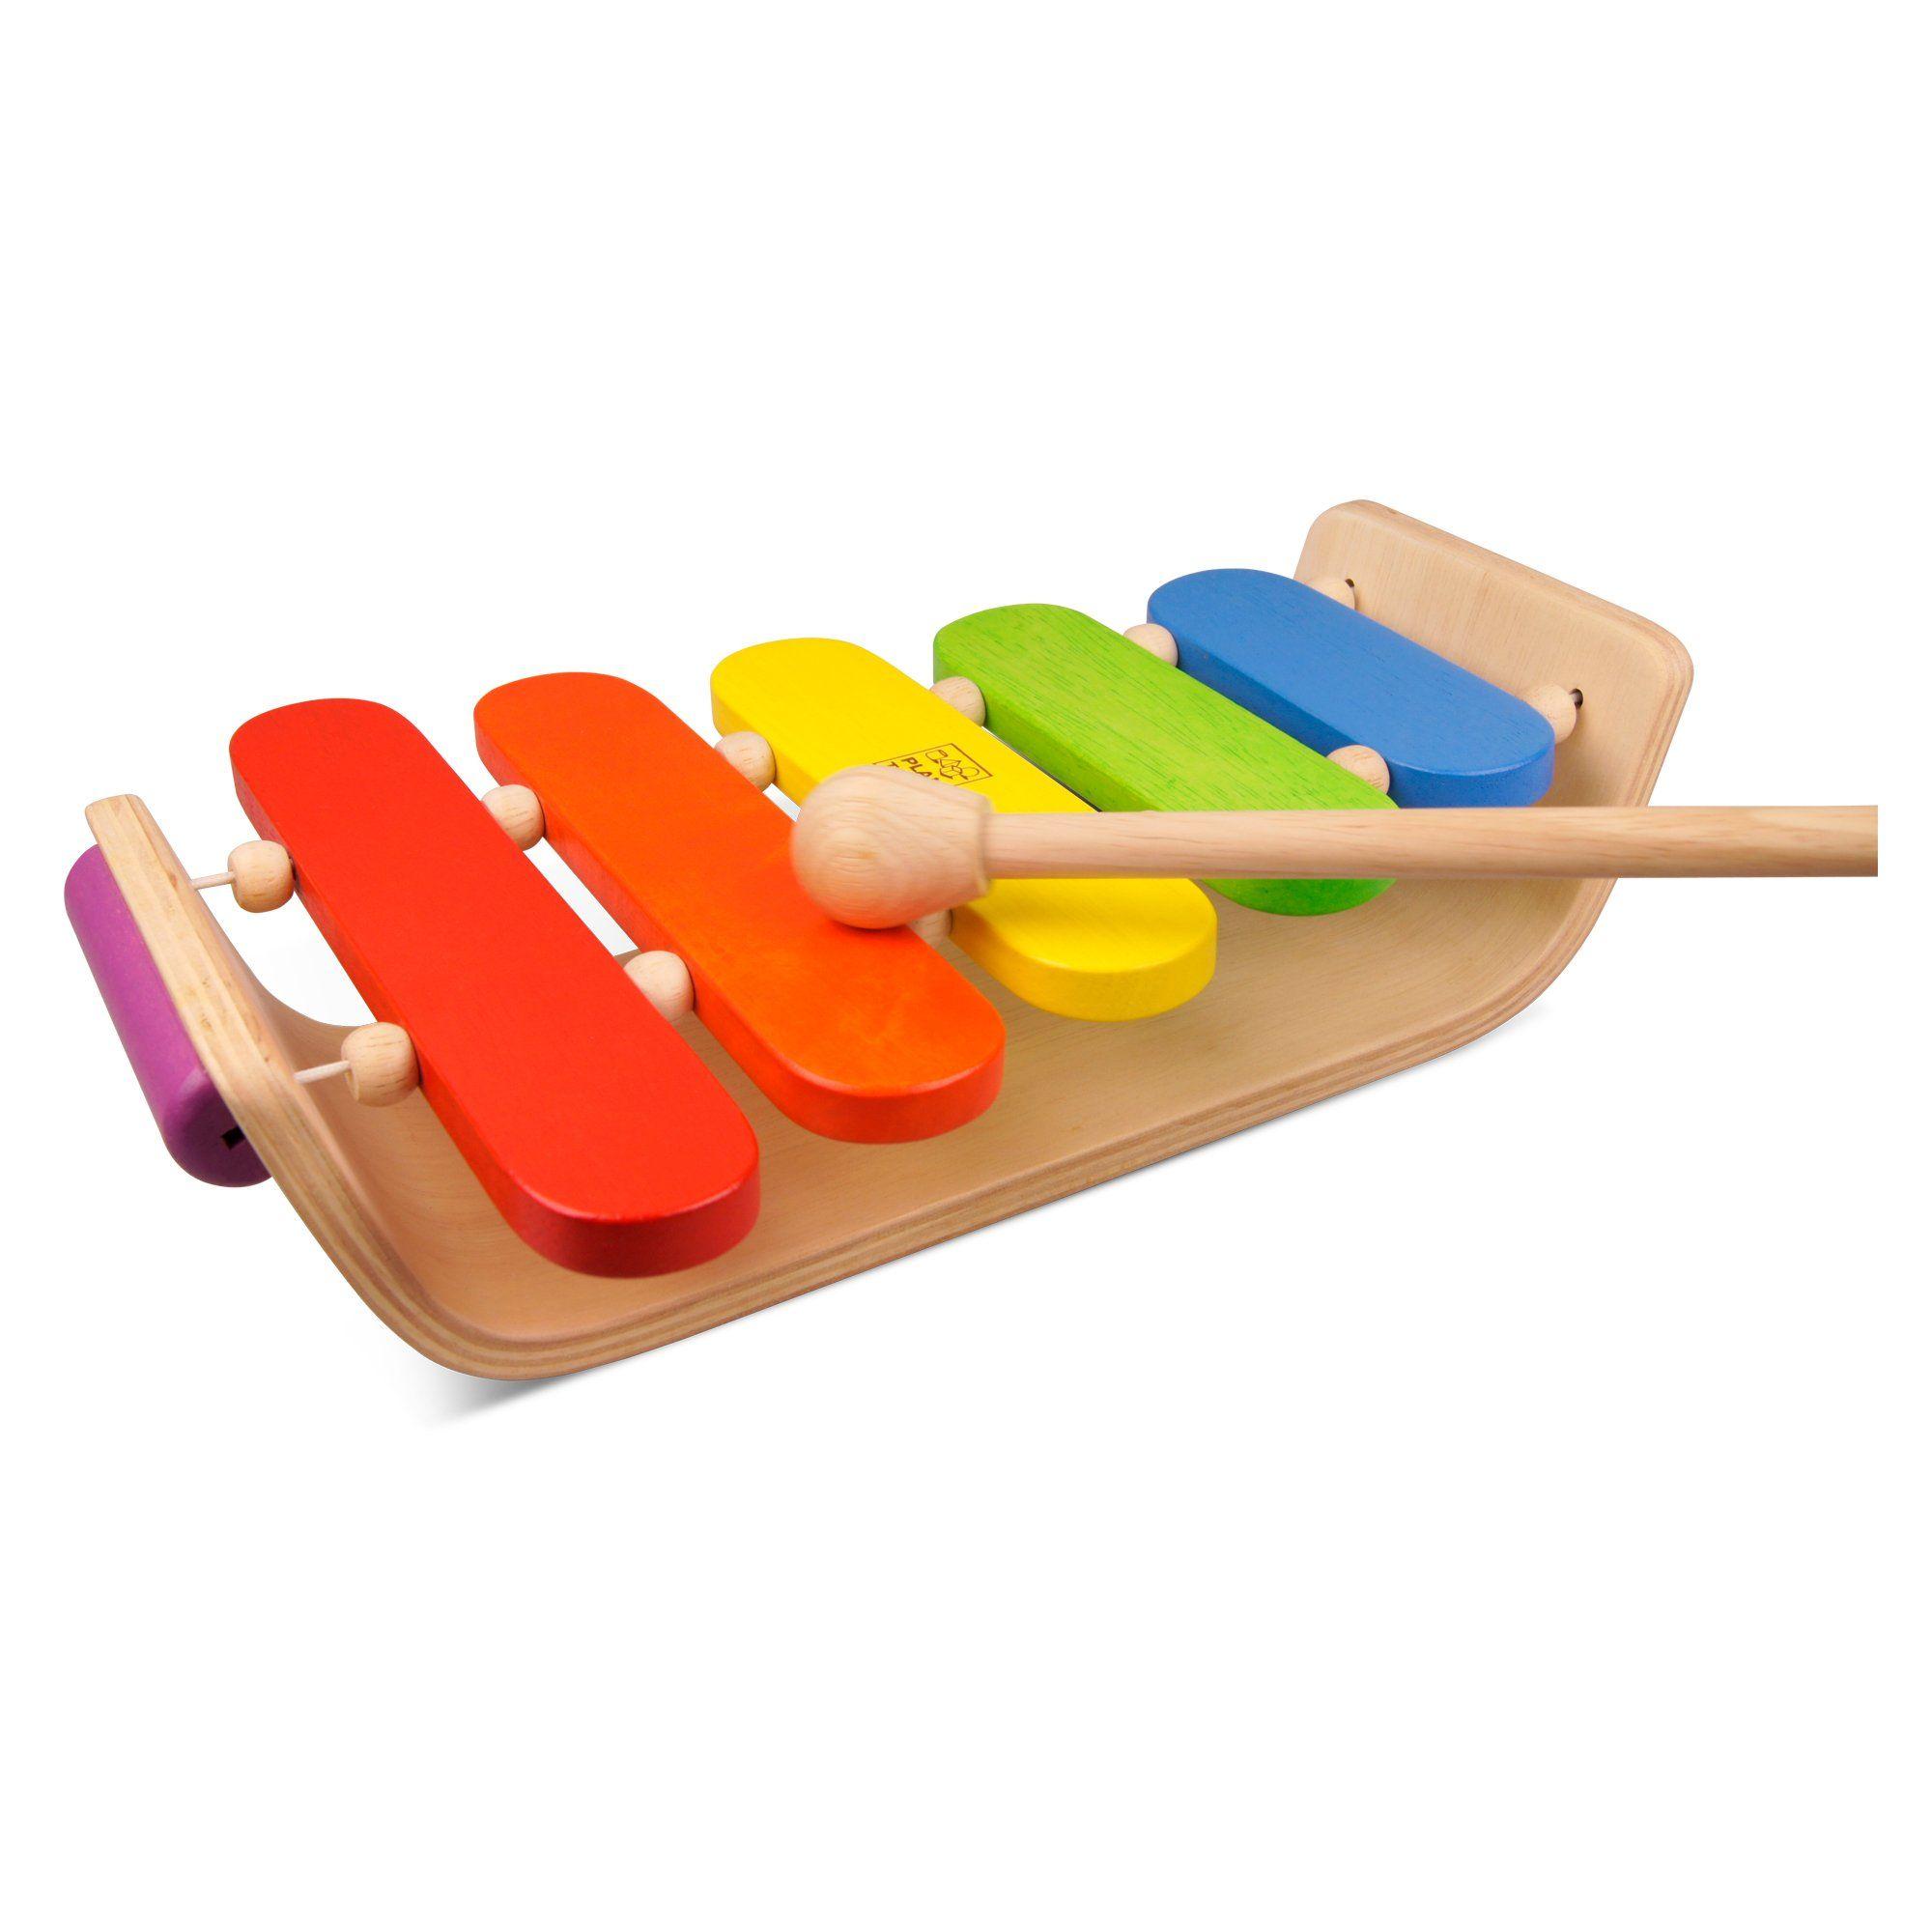 amazon: plan toy oval xylophone: toys & games